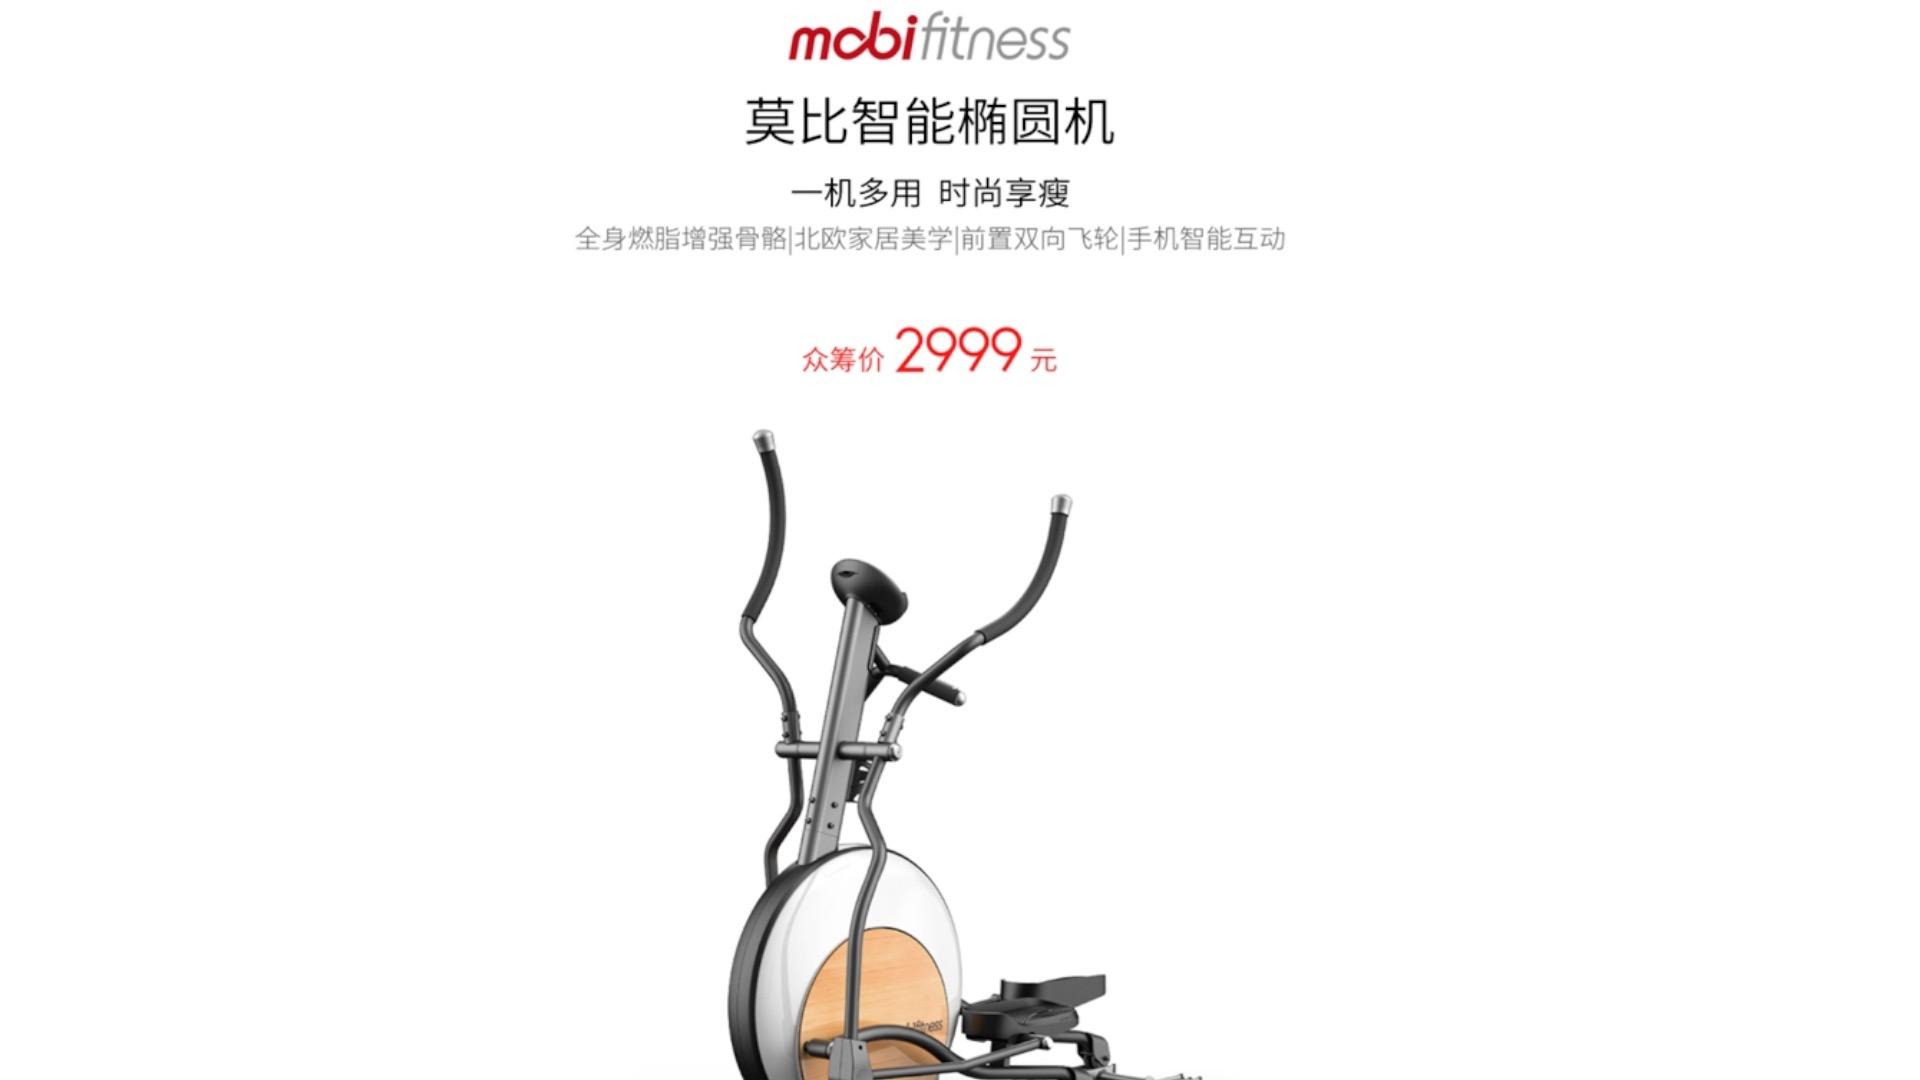 Precio de la Xiaomi Mobifitness Smart Elliptical Machine